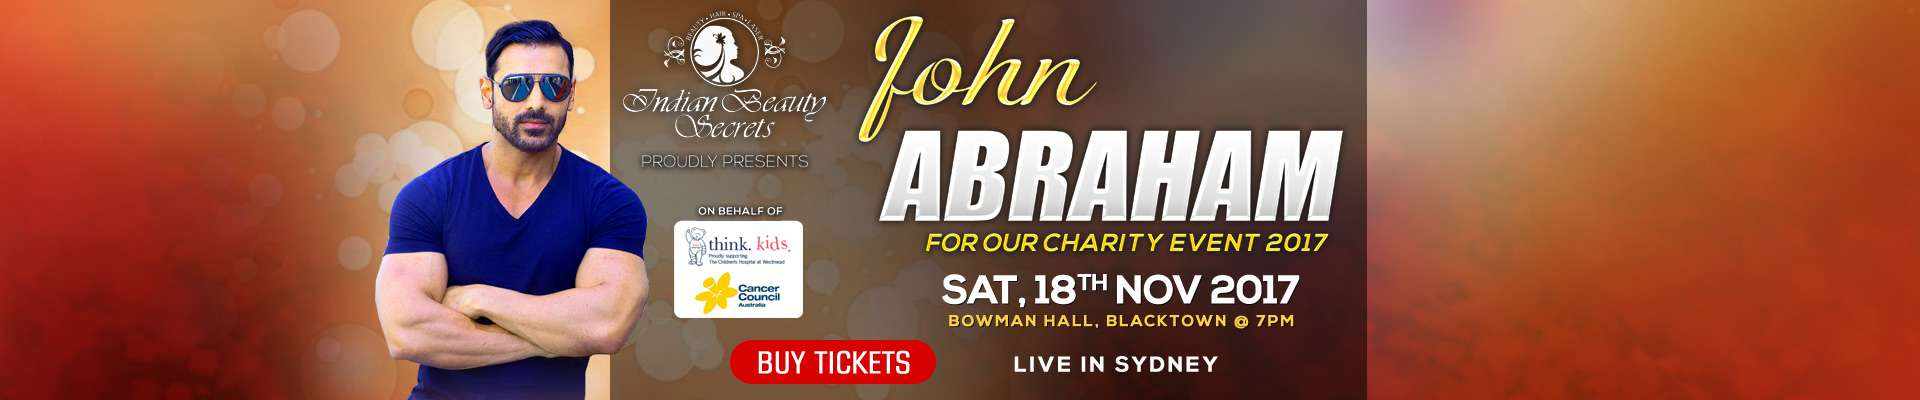 John Abraham - Charity Event 2017